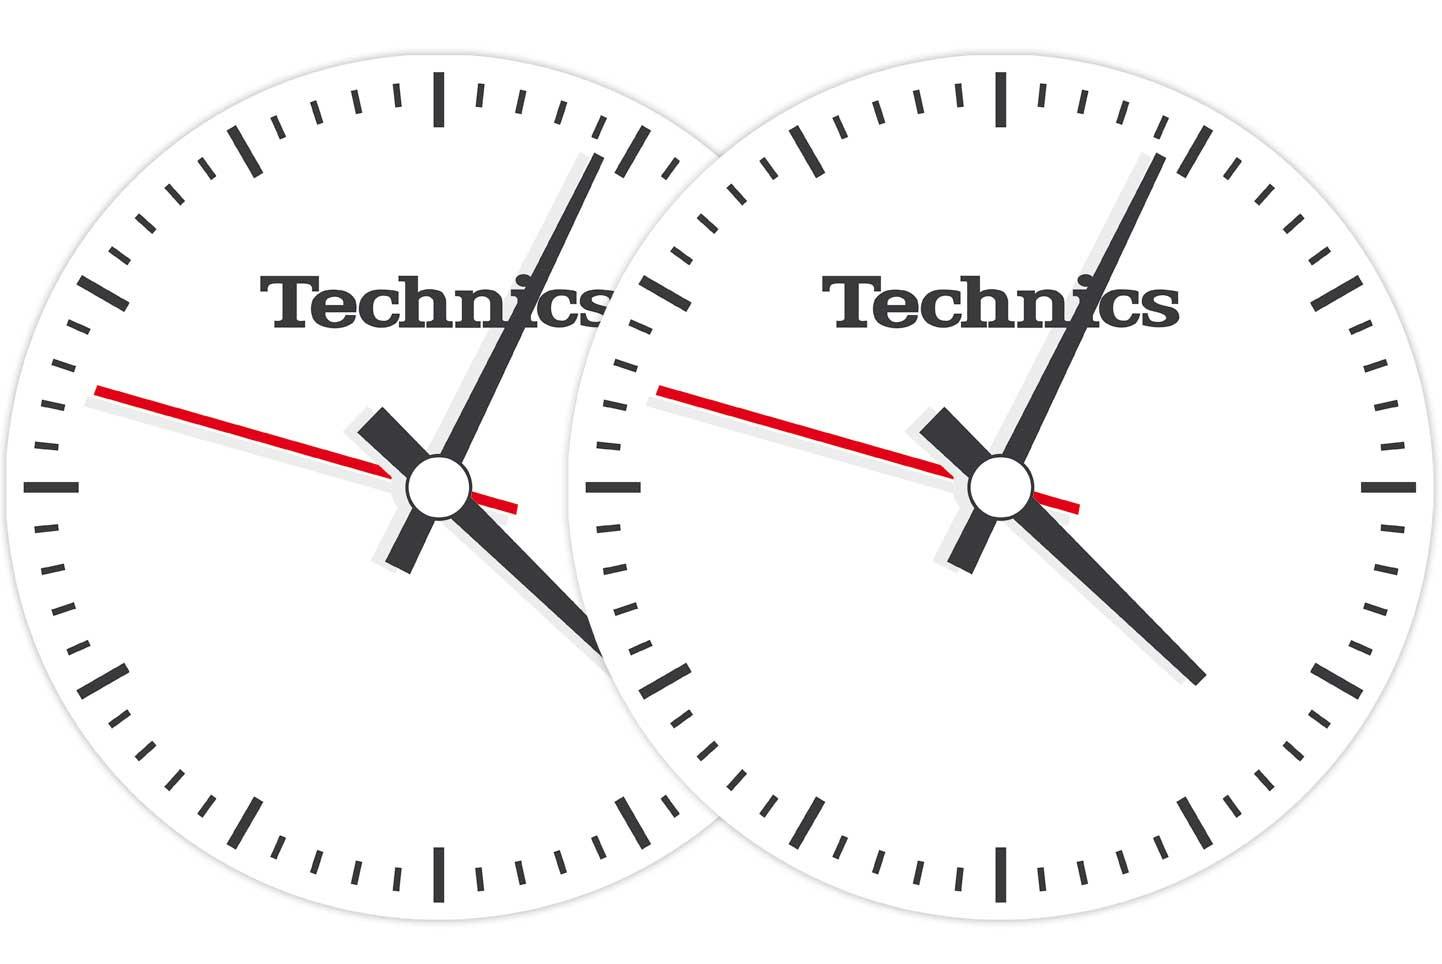 2x Slipmats - Technics Time